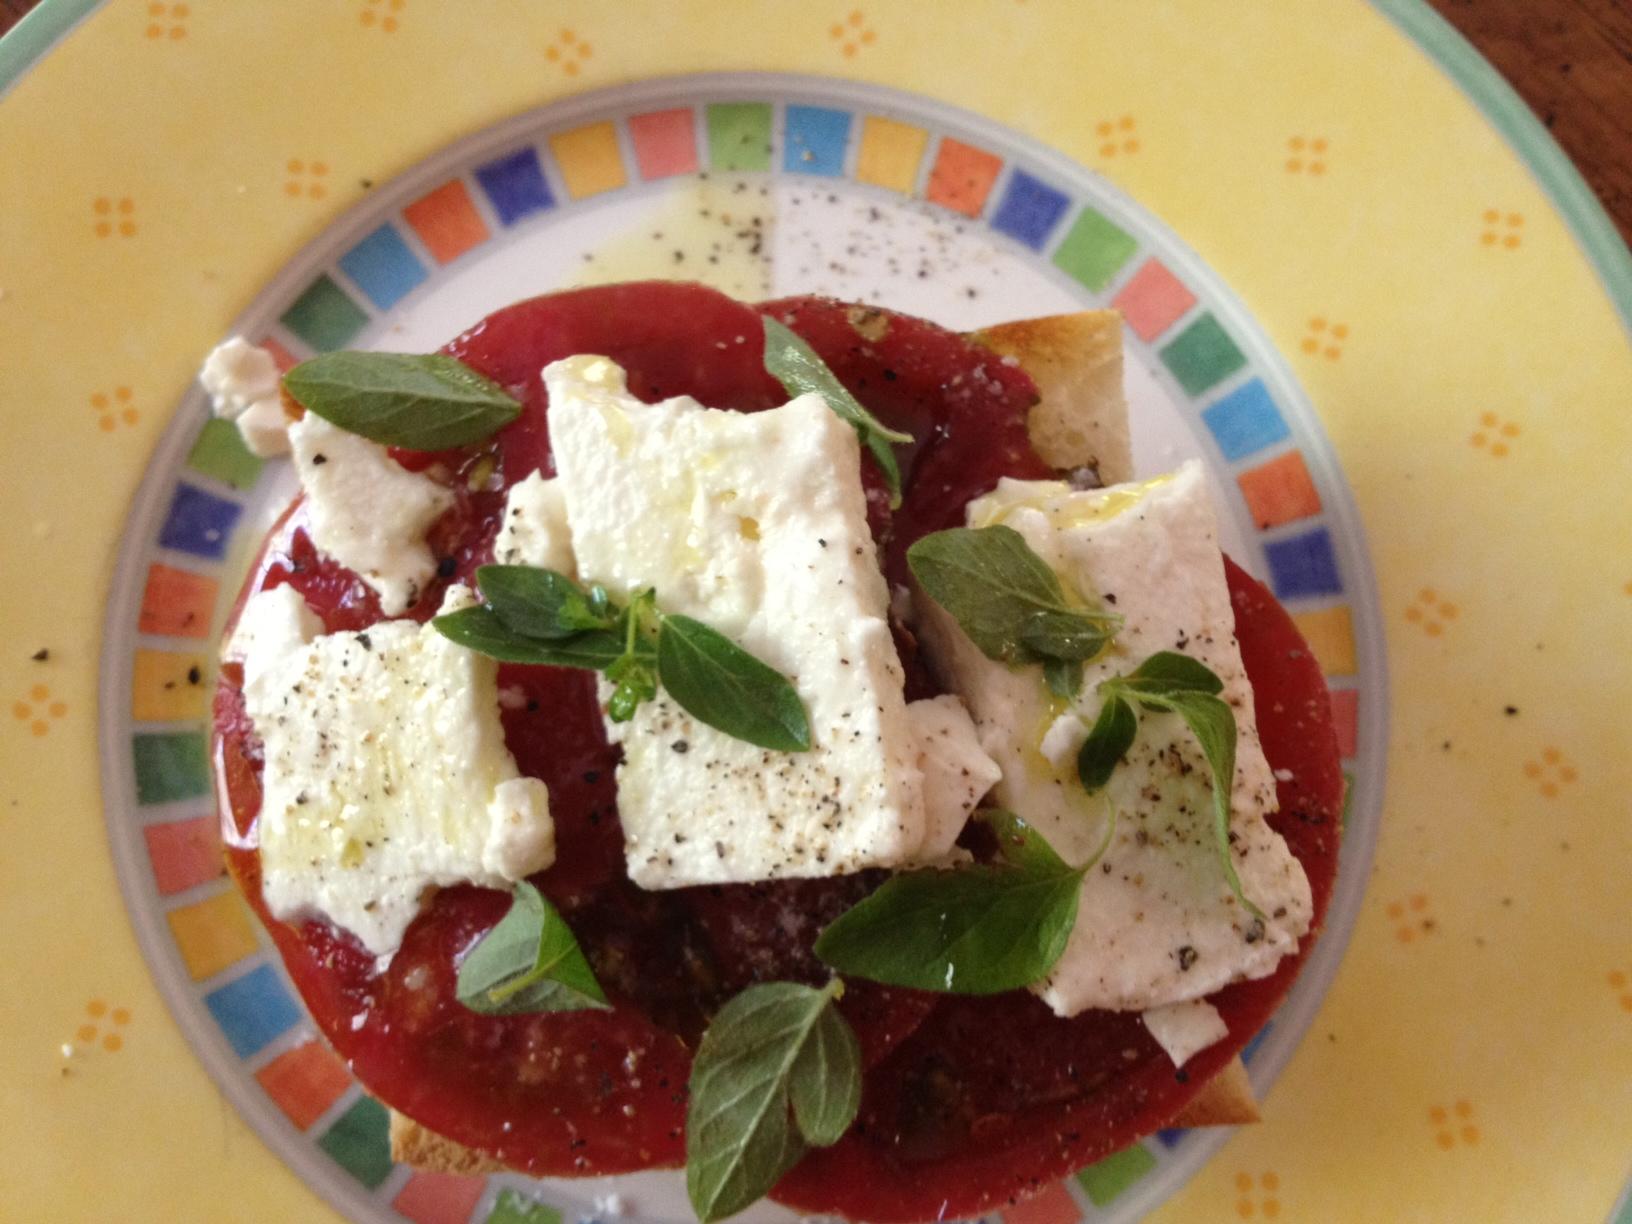 heirloom tomato sandwich with feta and fresh oregano | Serving The ...